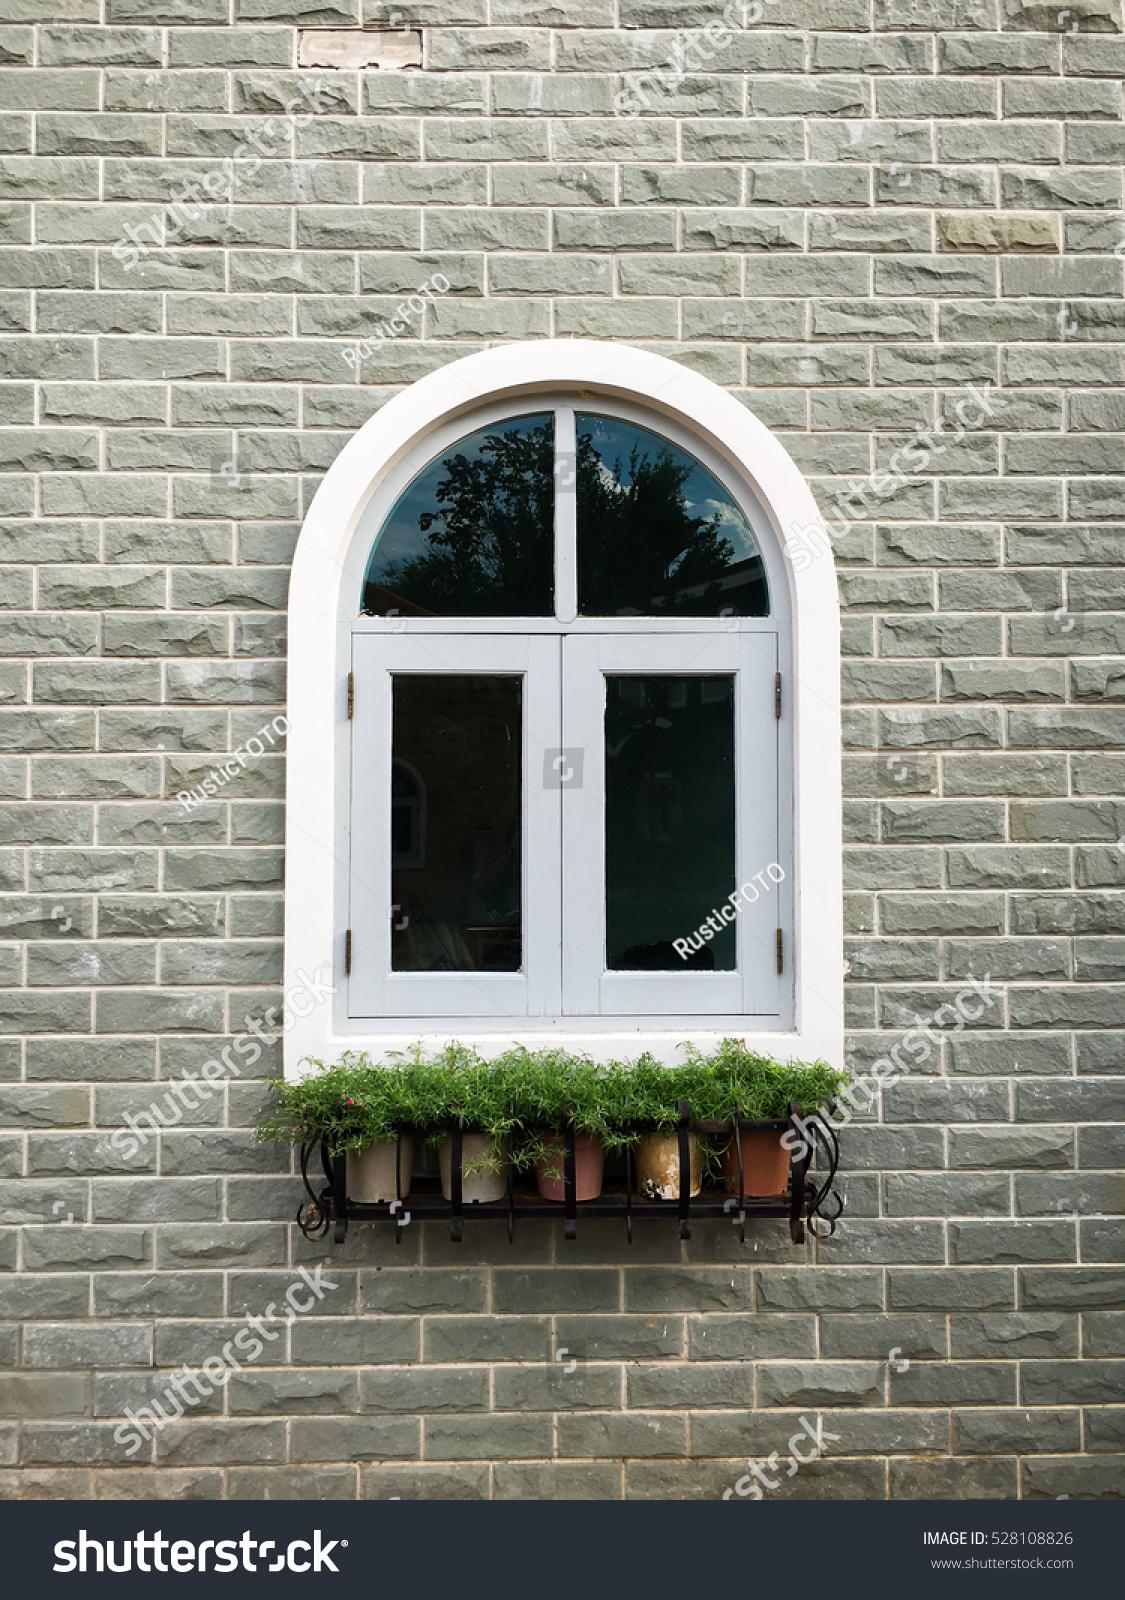 European style window brick wall background stock photo for European style windows